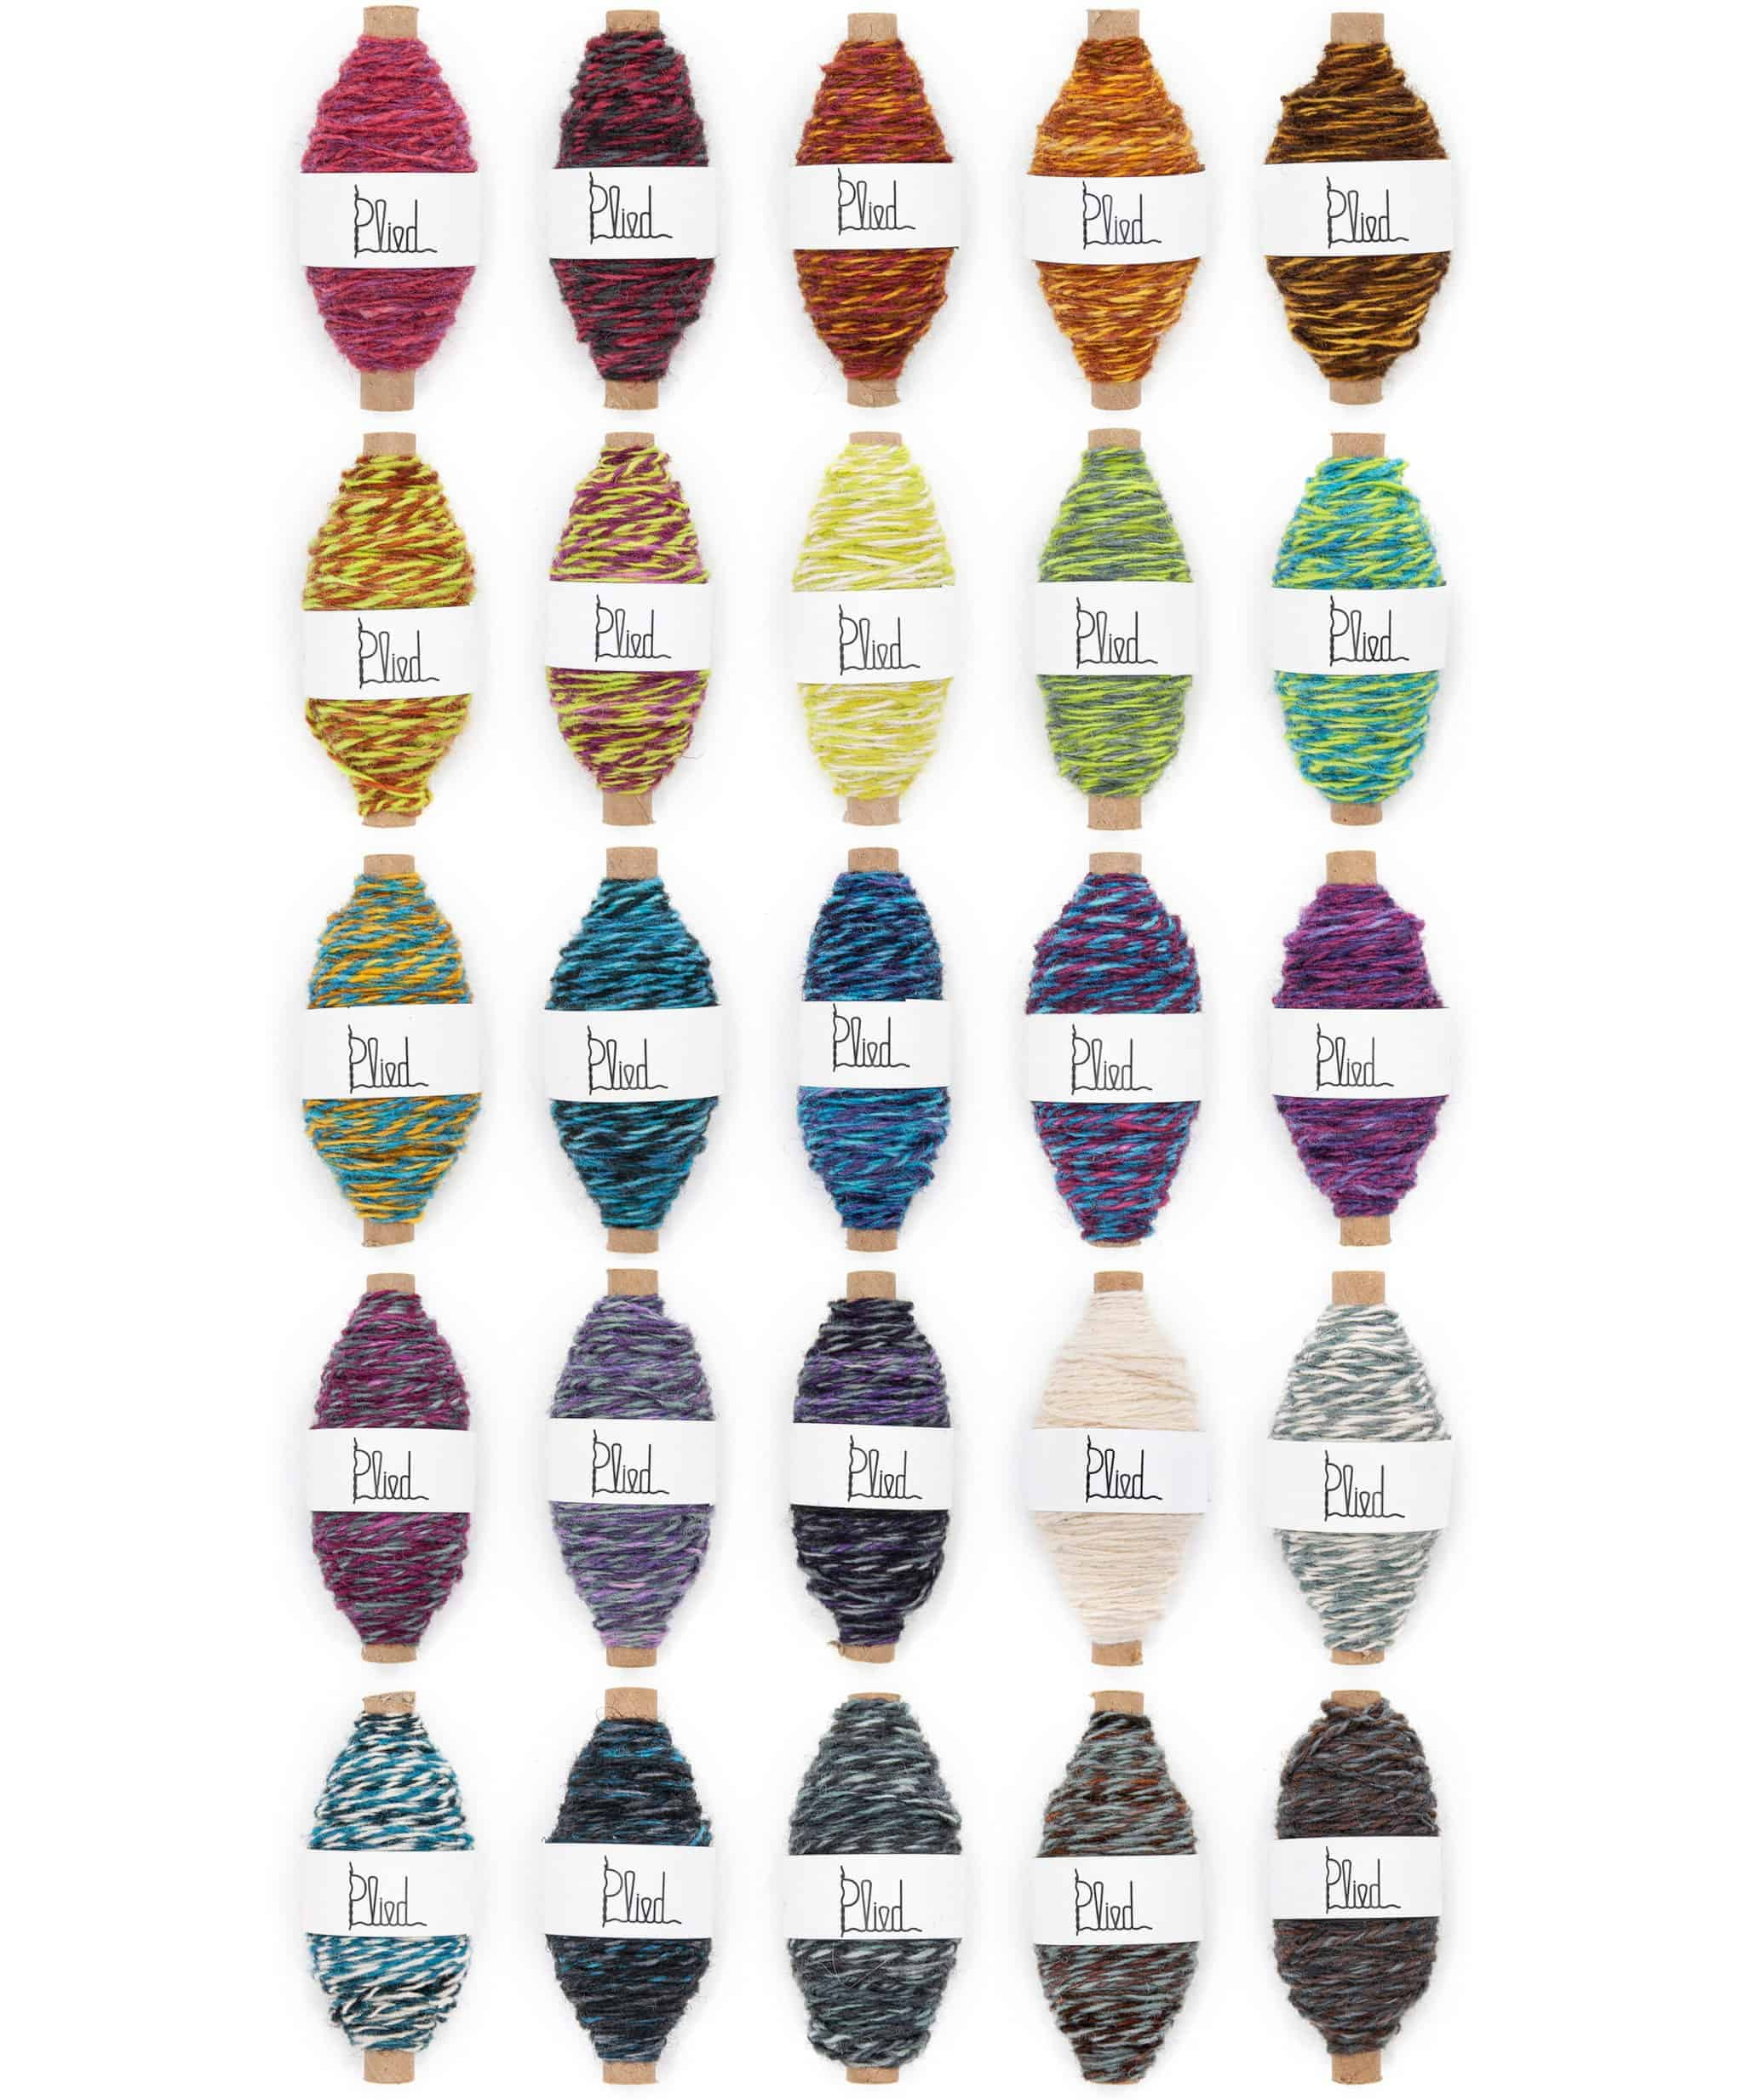 Bobbins of colorful yarn.